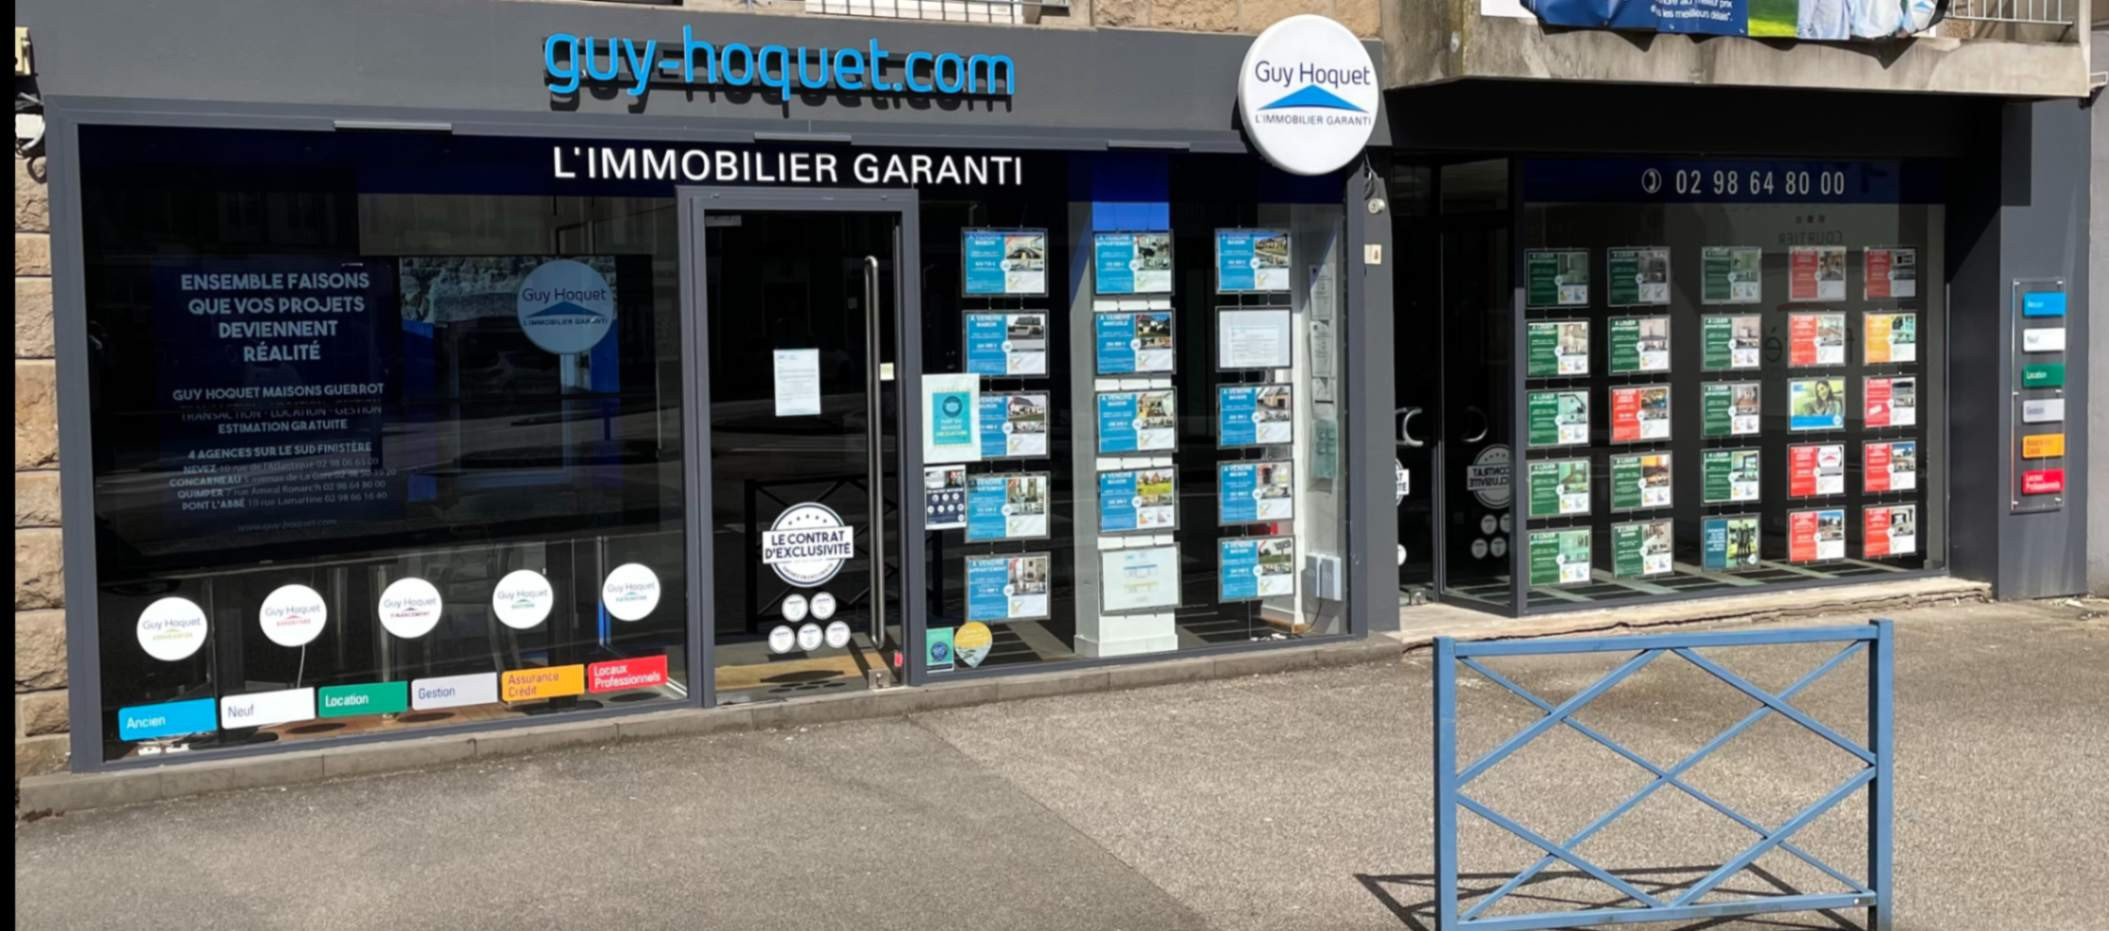 Agence Guy Hoquet QUIMPER